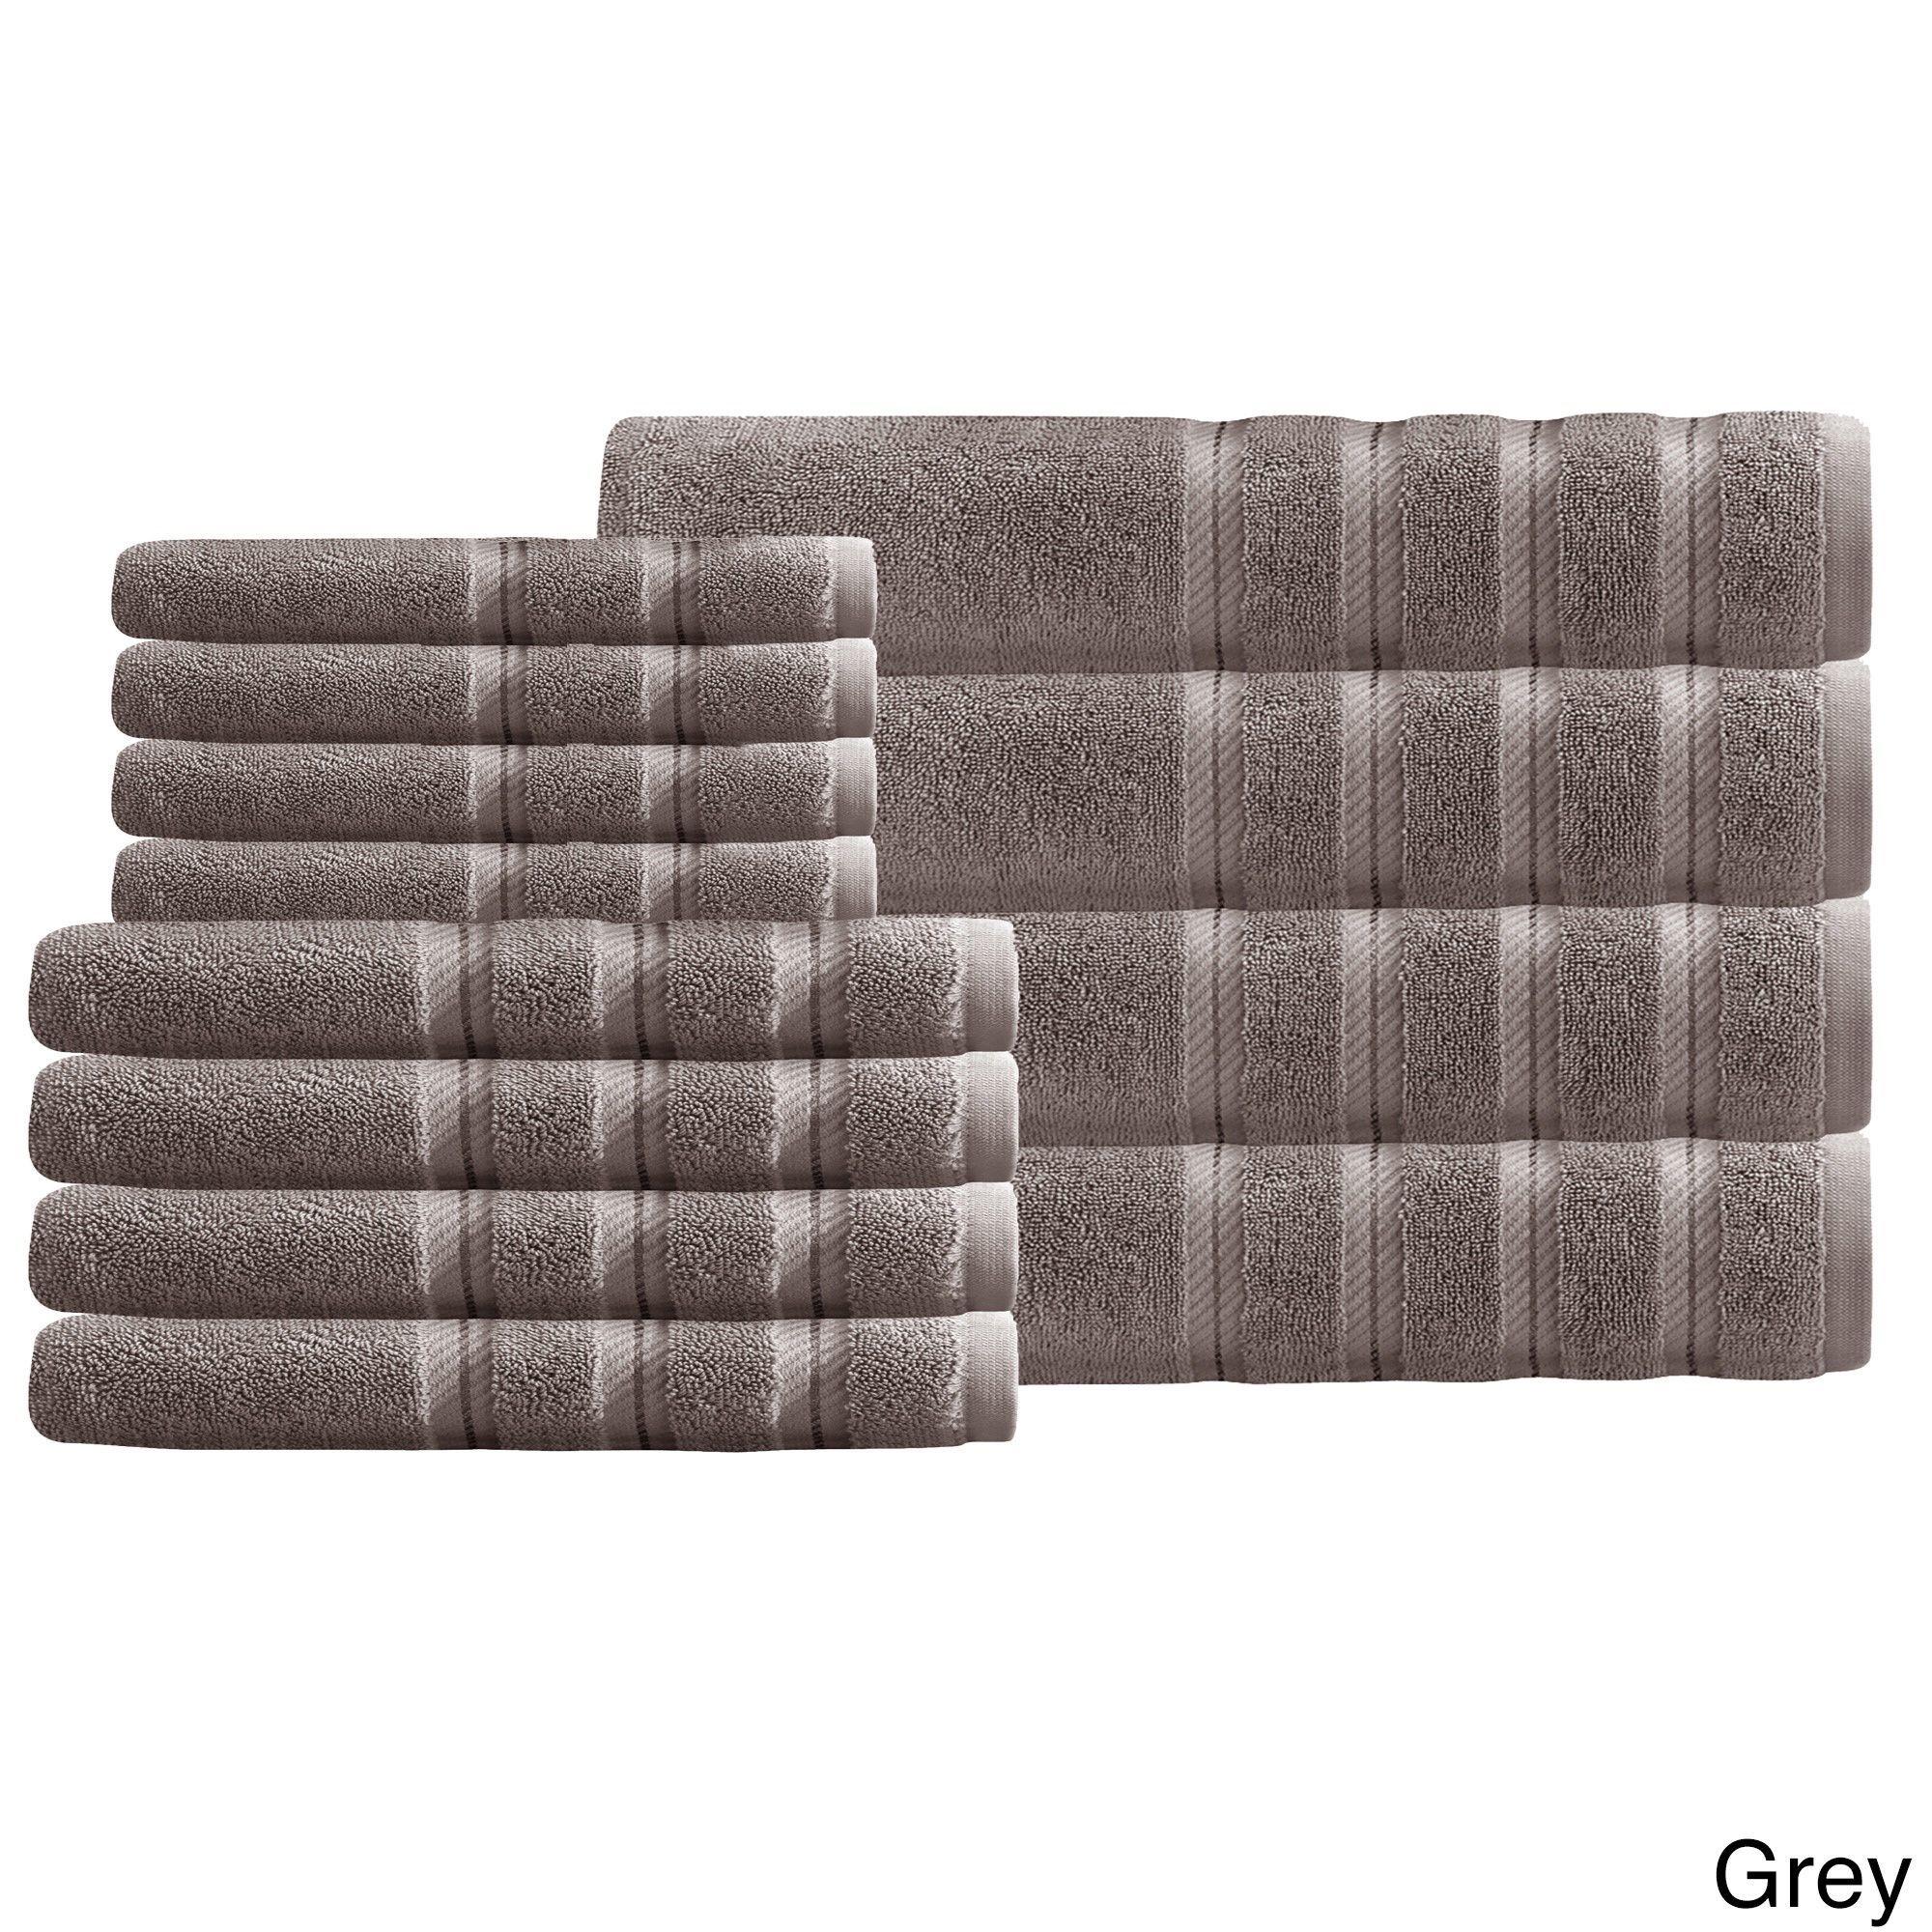 Antalya Collection Salbakos Luxury 600 GSM 12-piece Towel Set